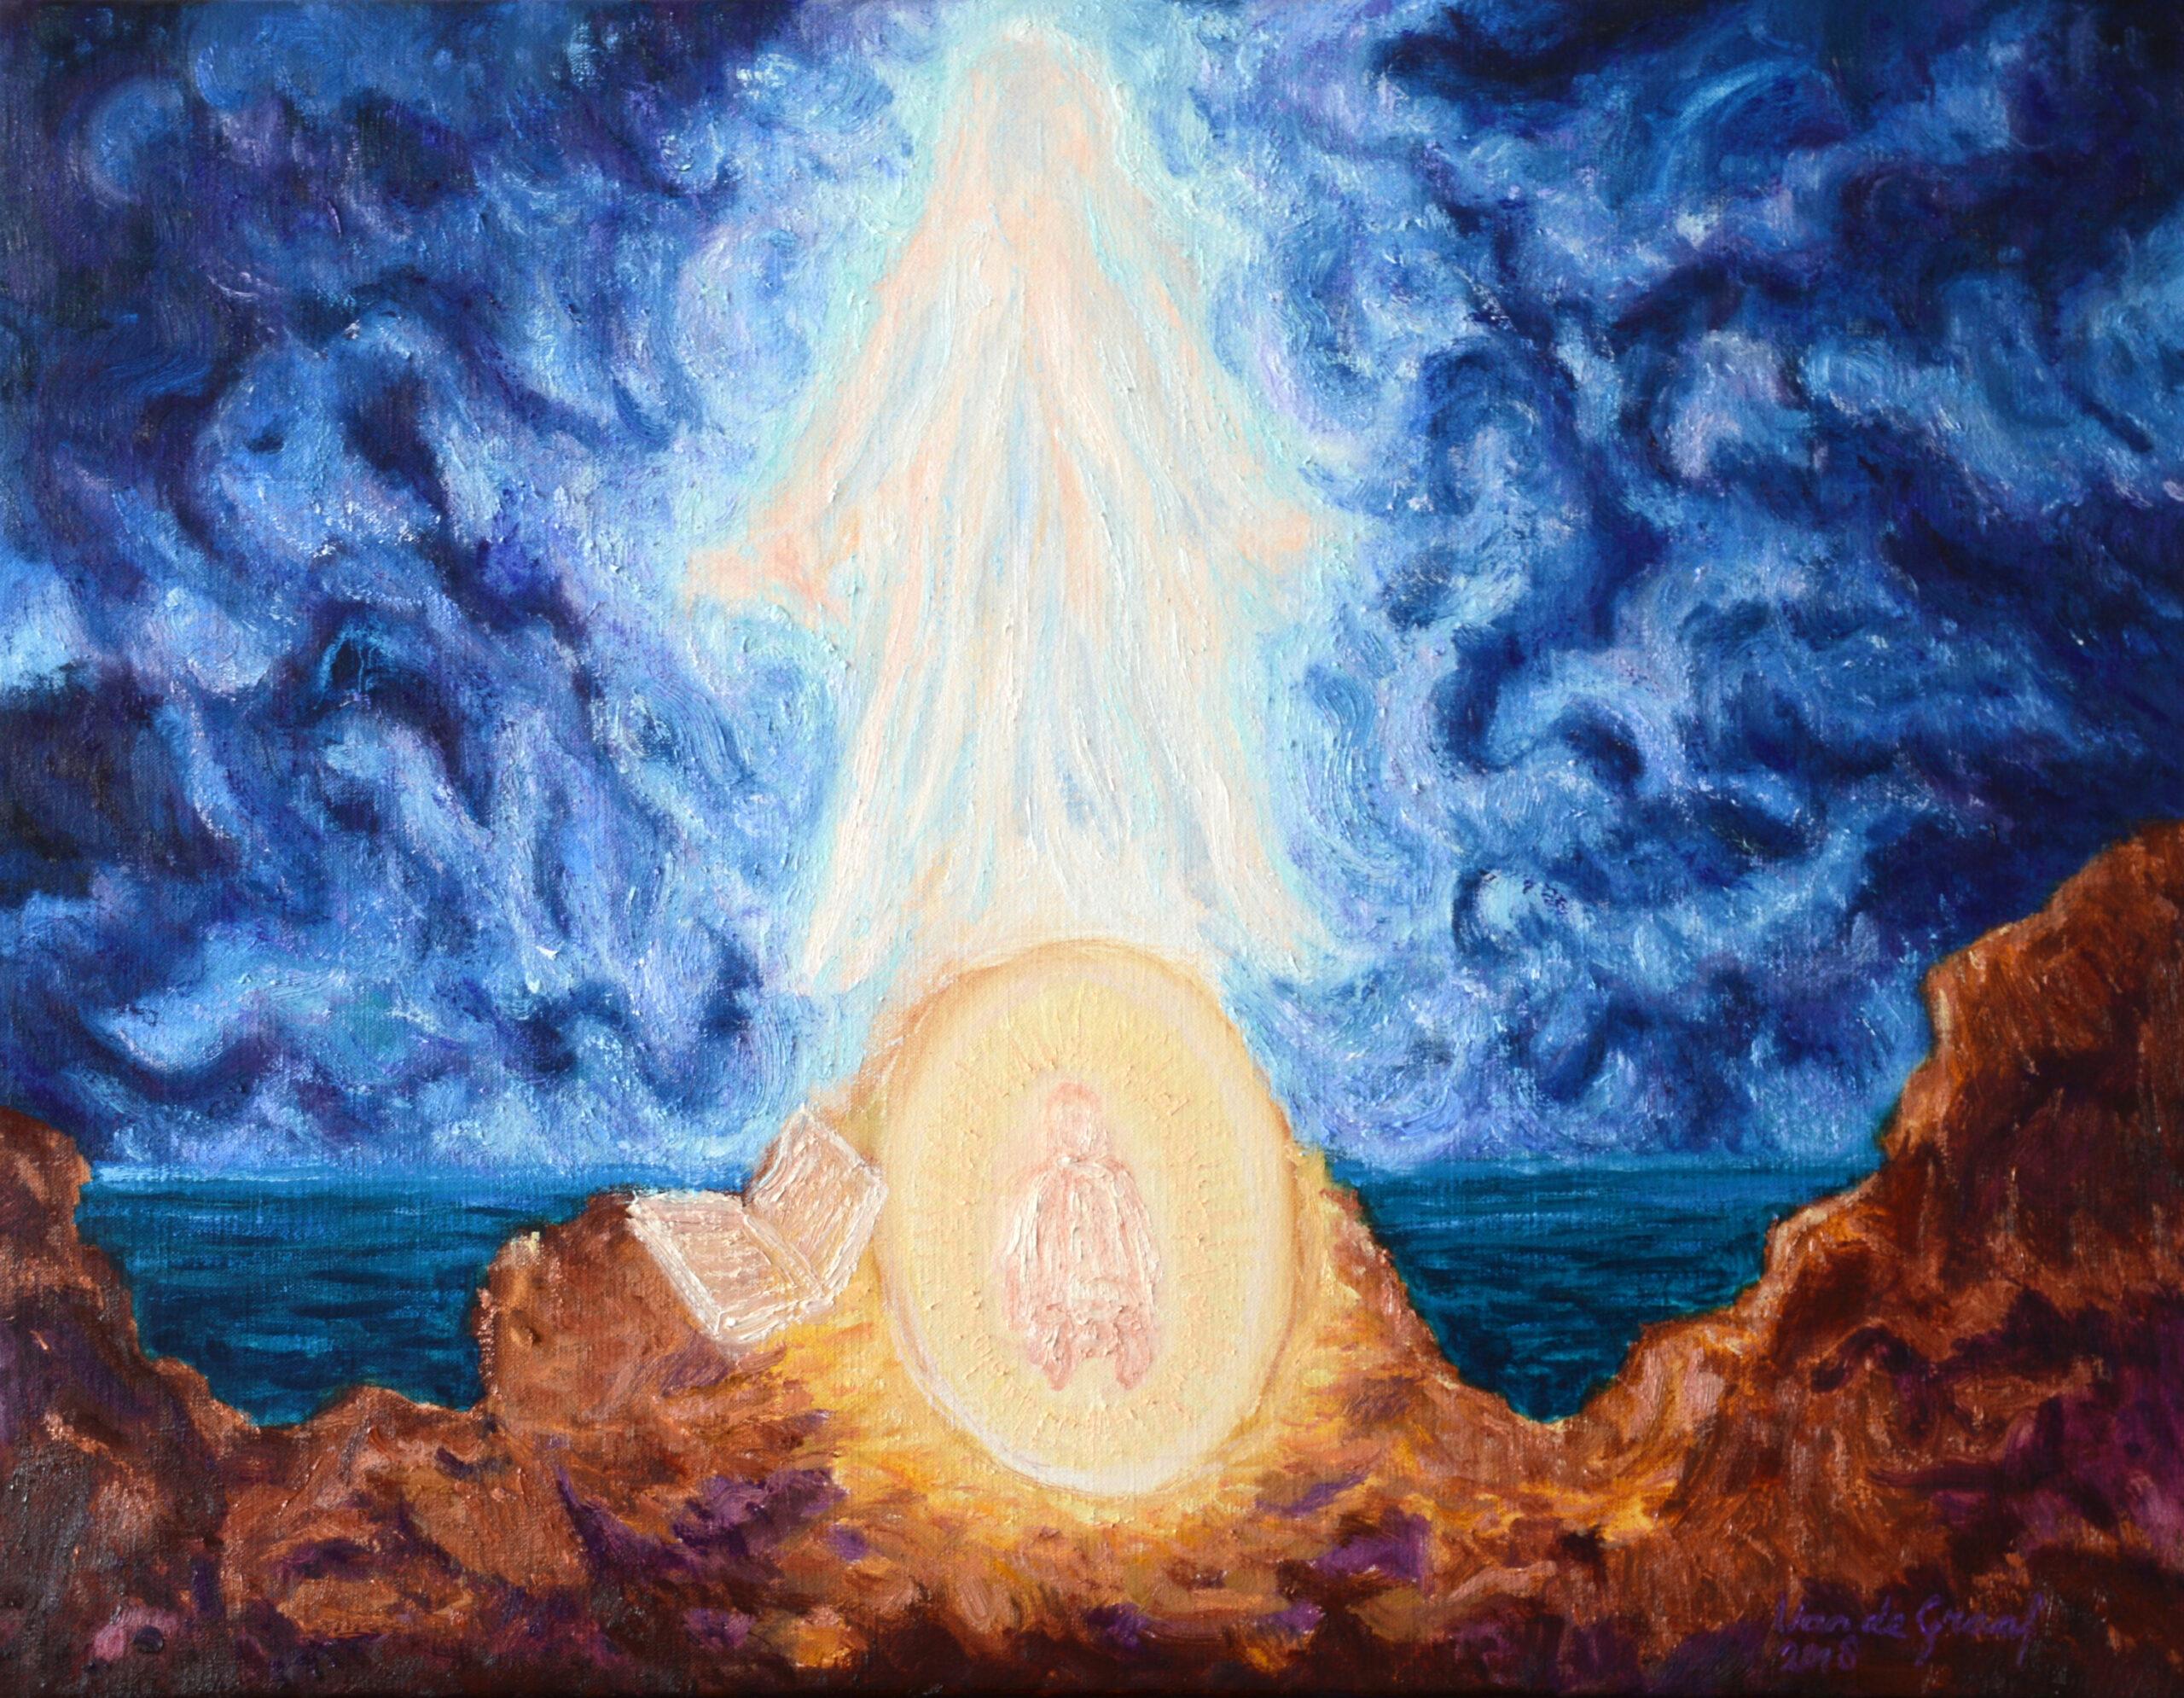 St. John's Vocation to Write The Revelations